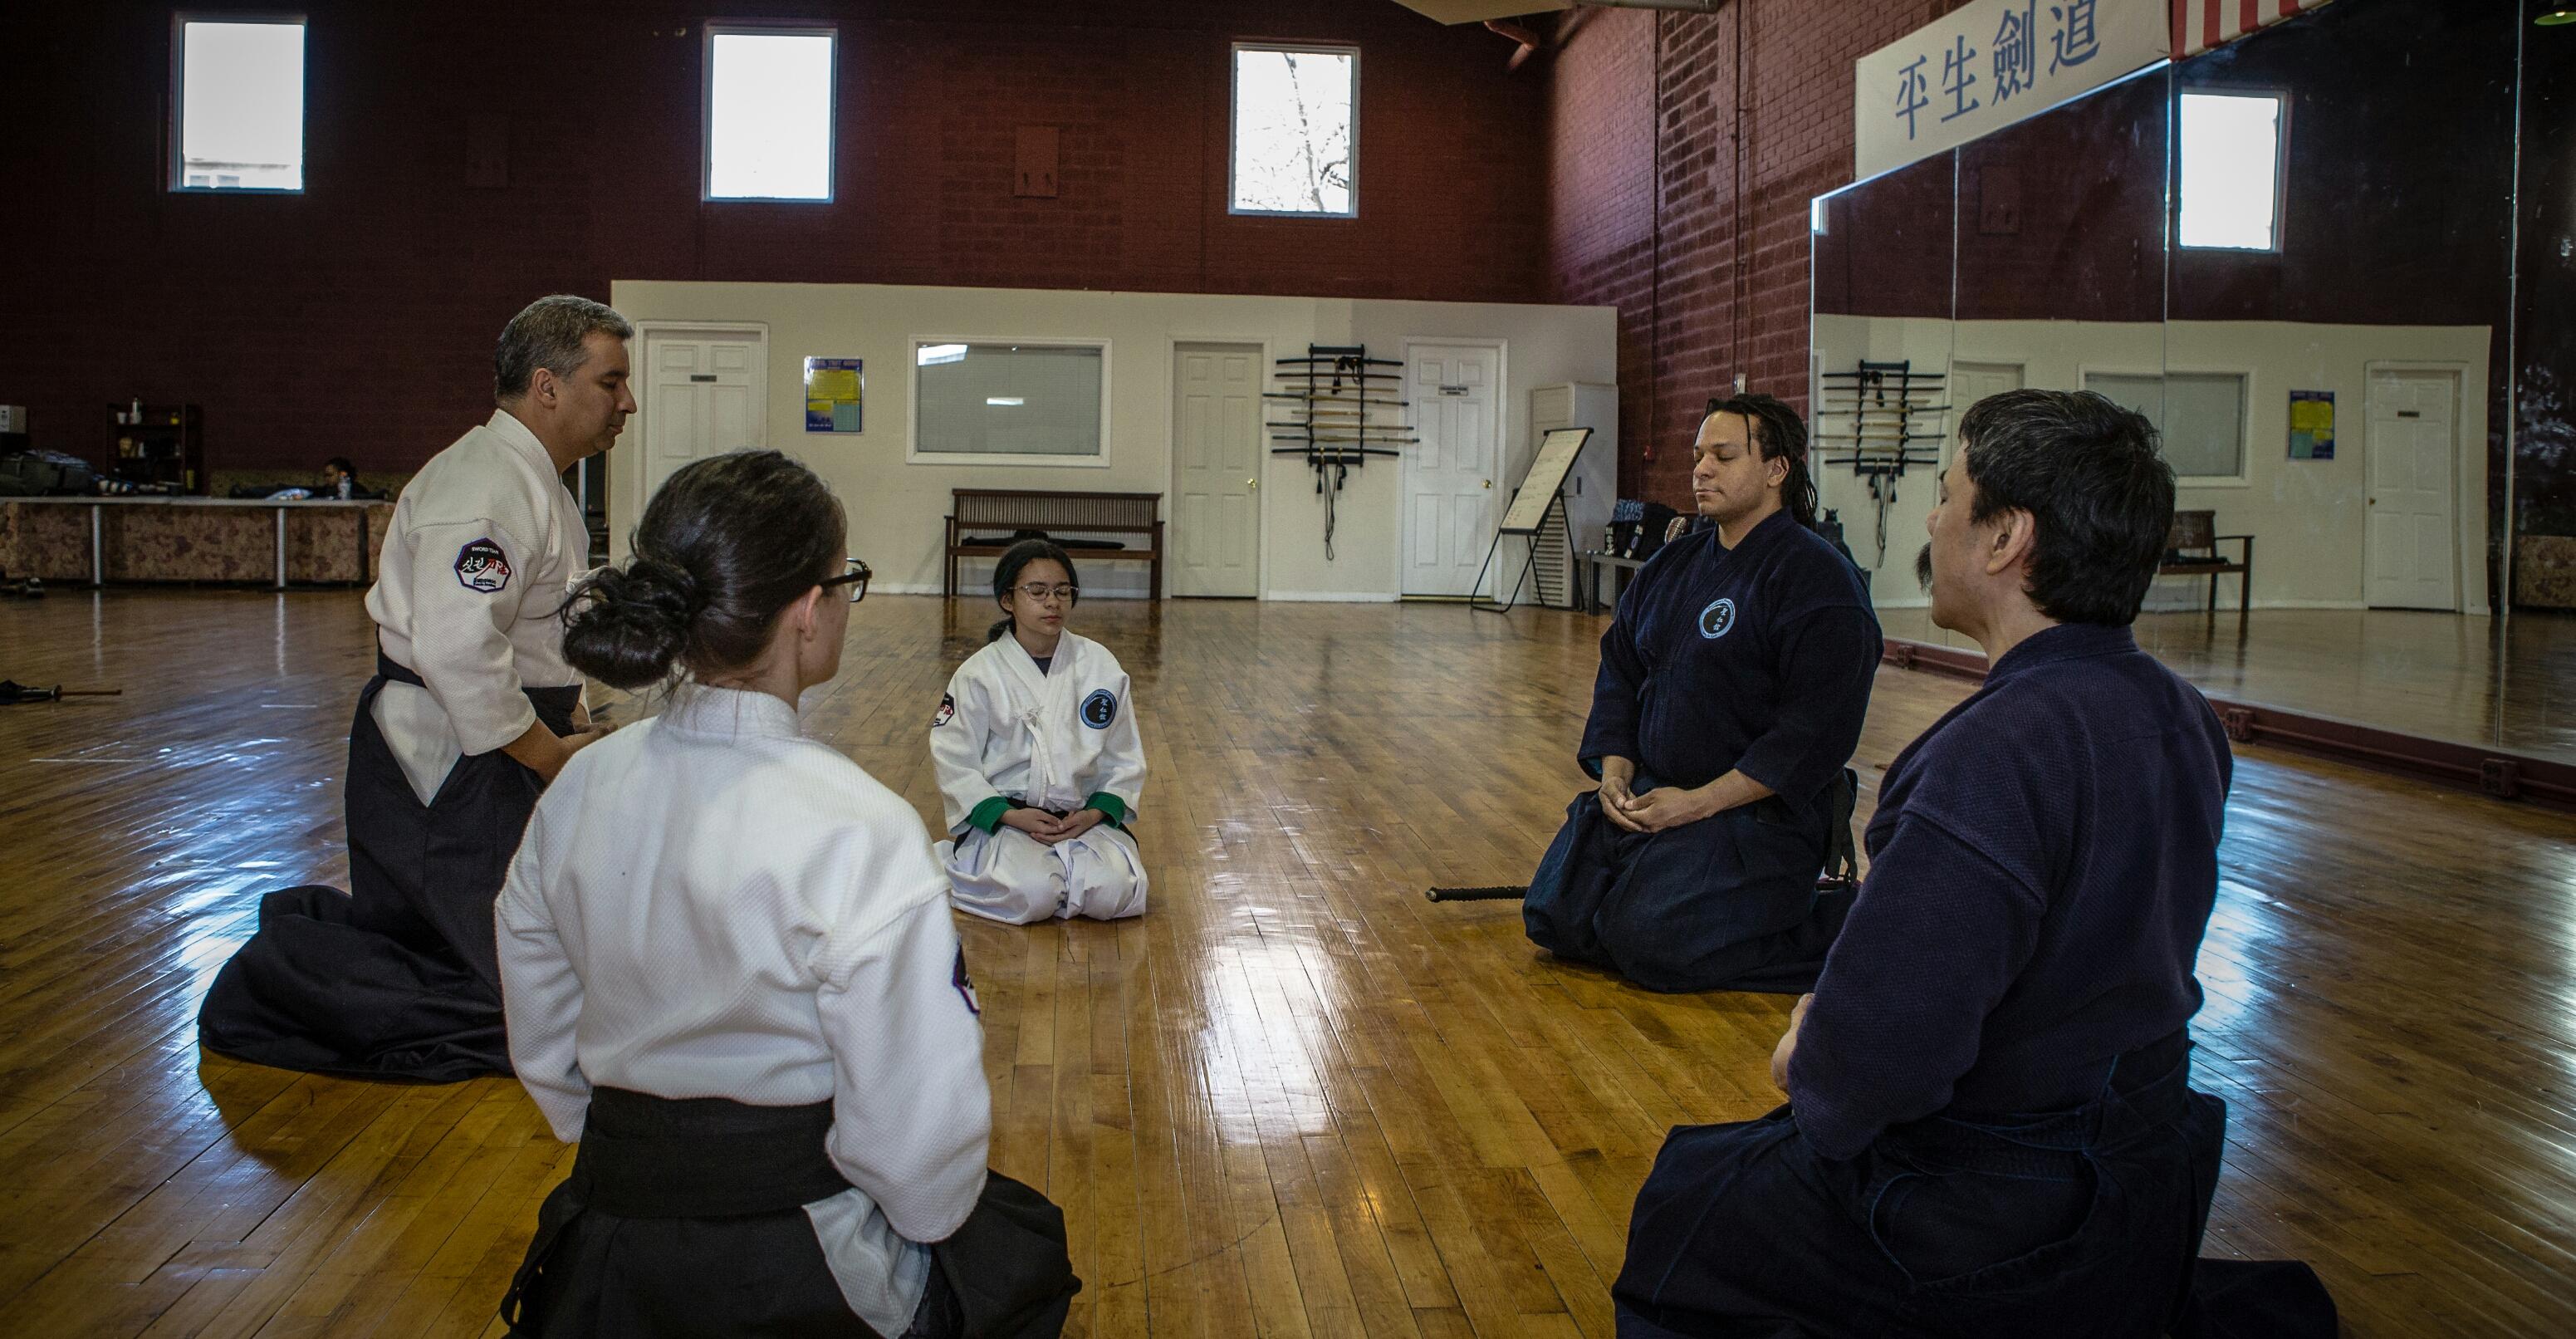 Meditation - Perception Sword Academy